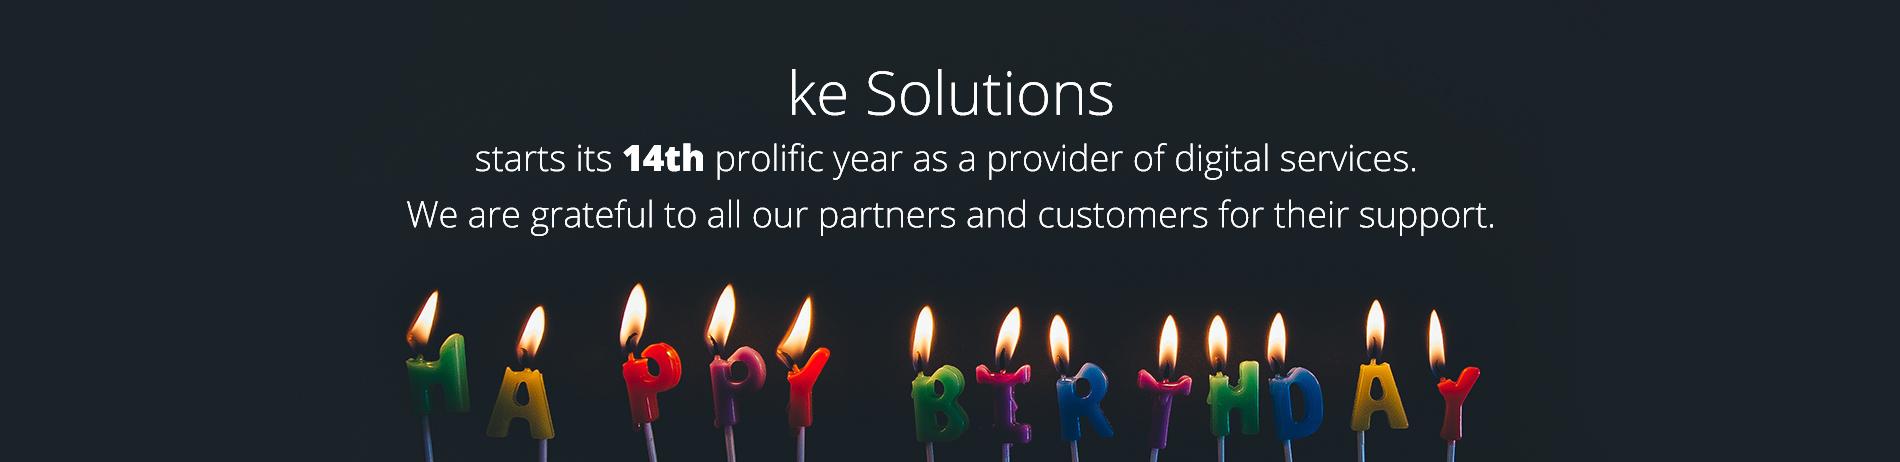 ke Solutions Anniversary